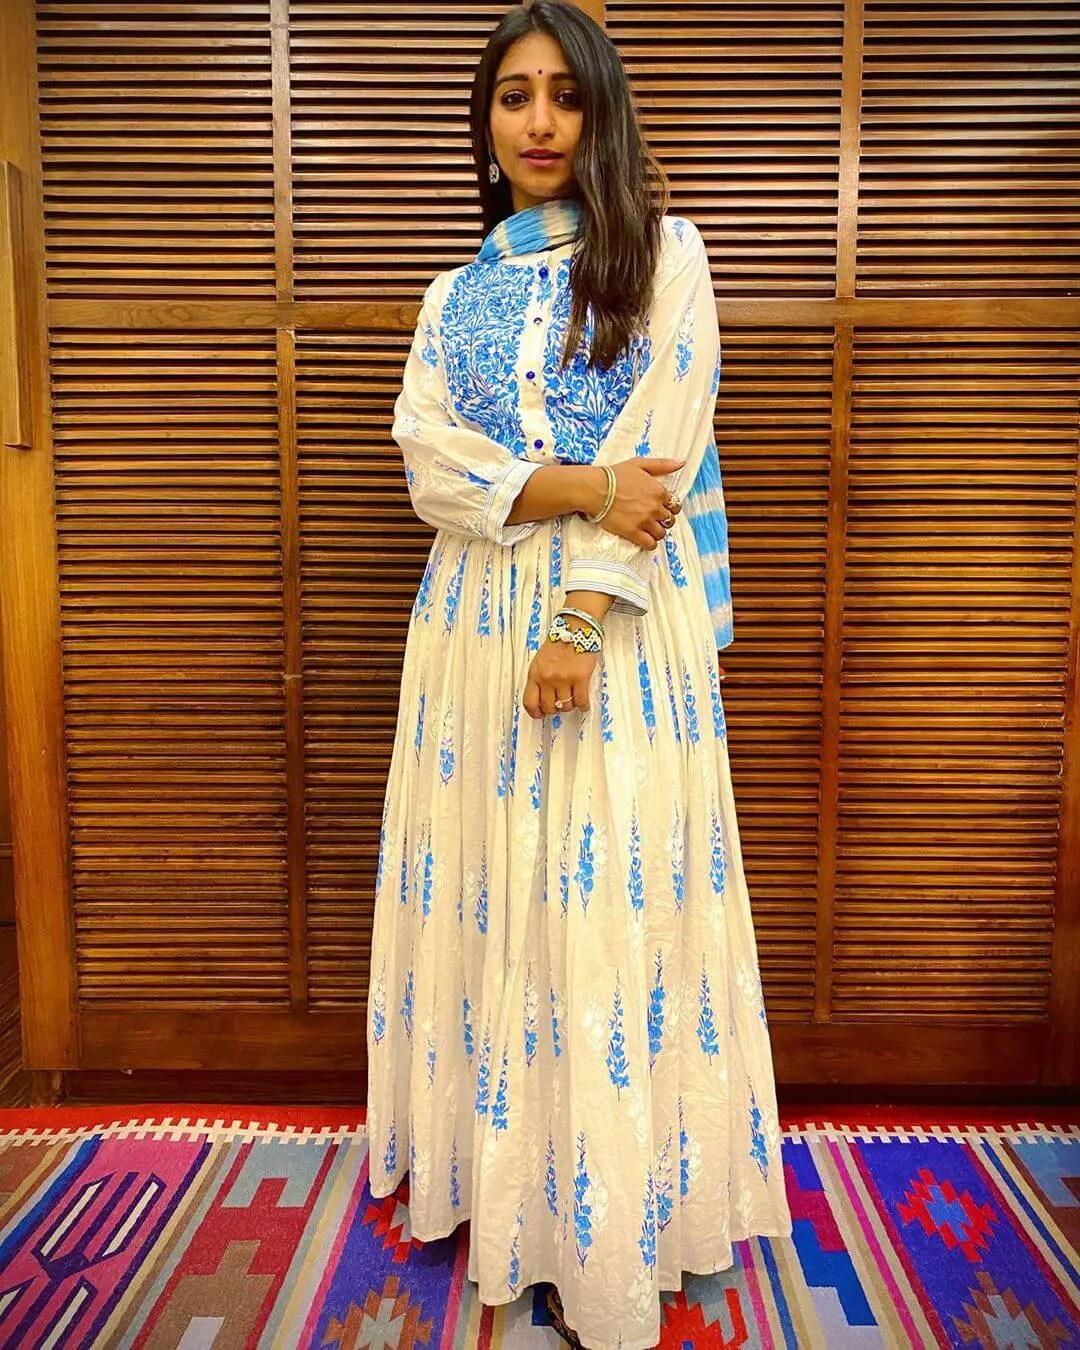 actress Mohena Singh